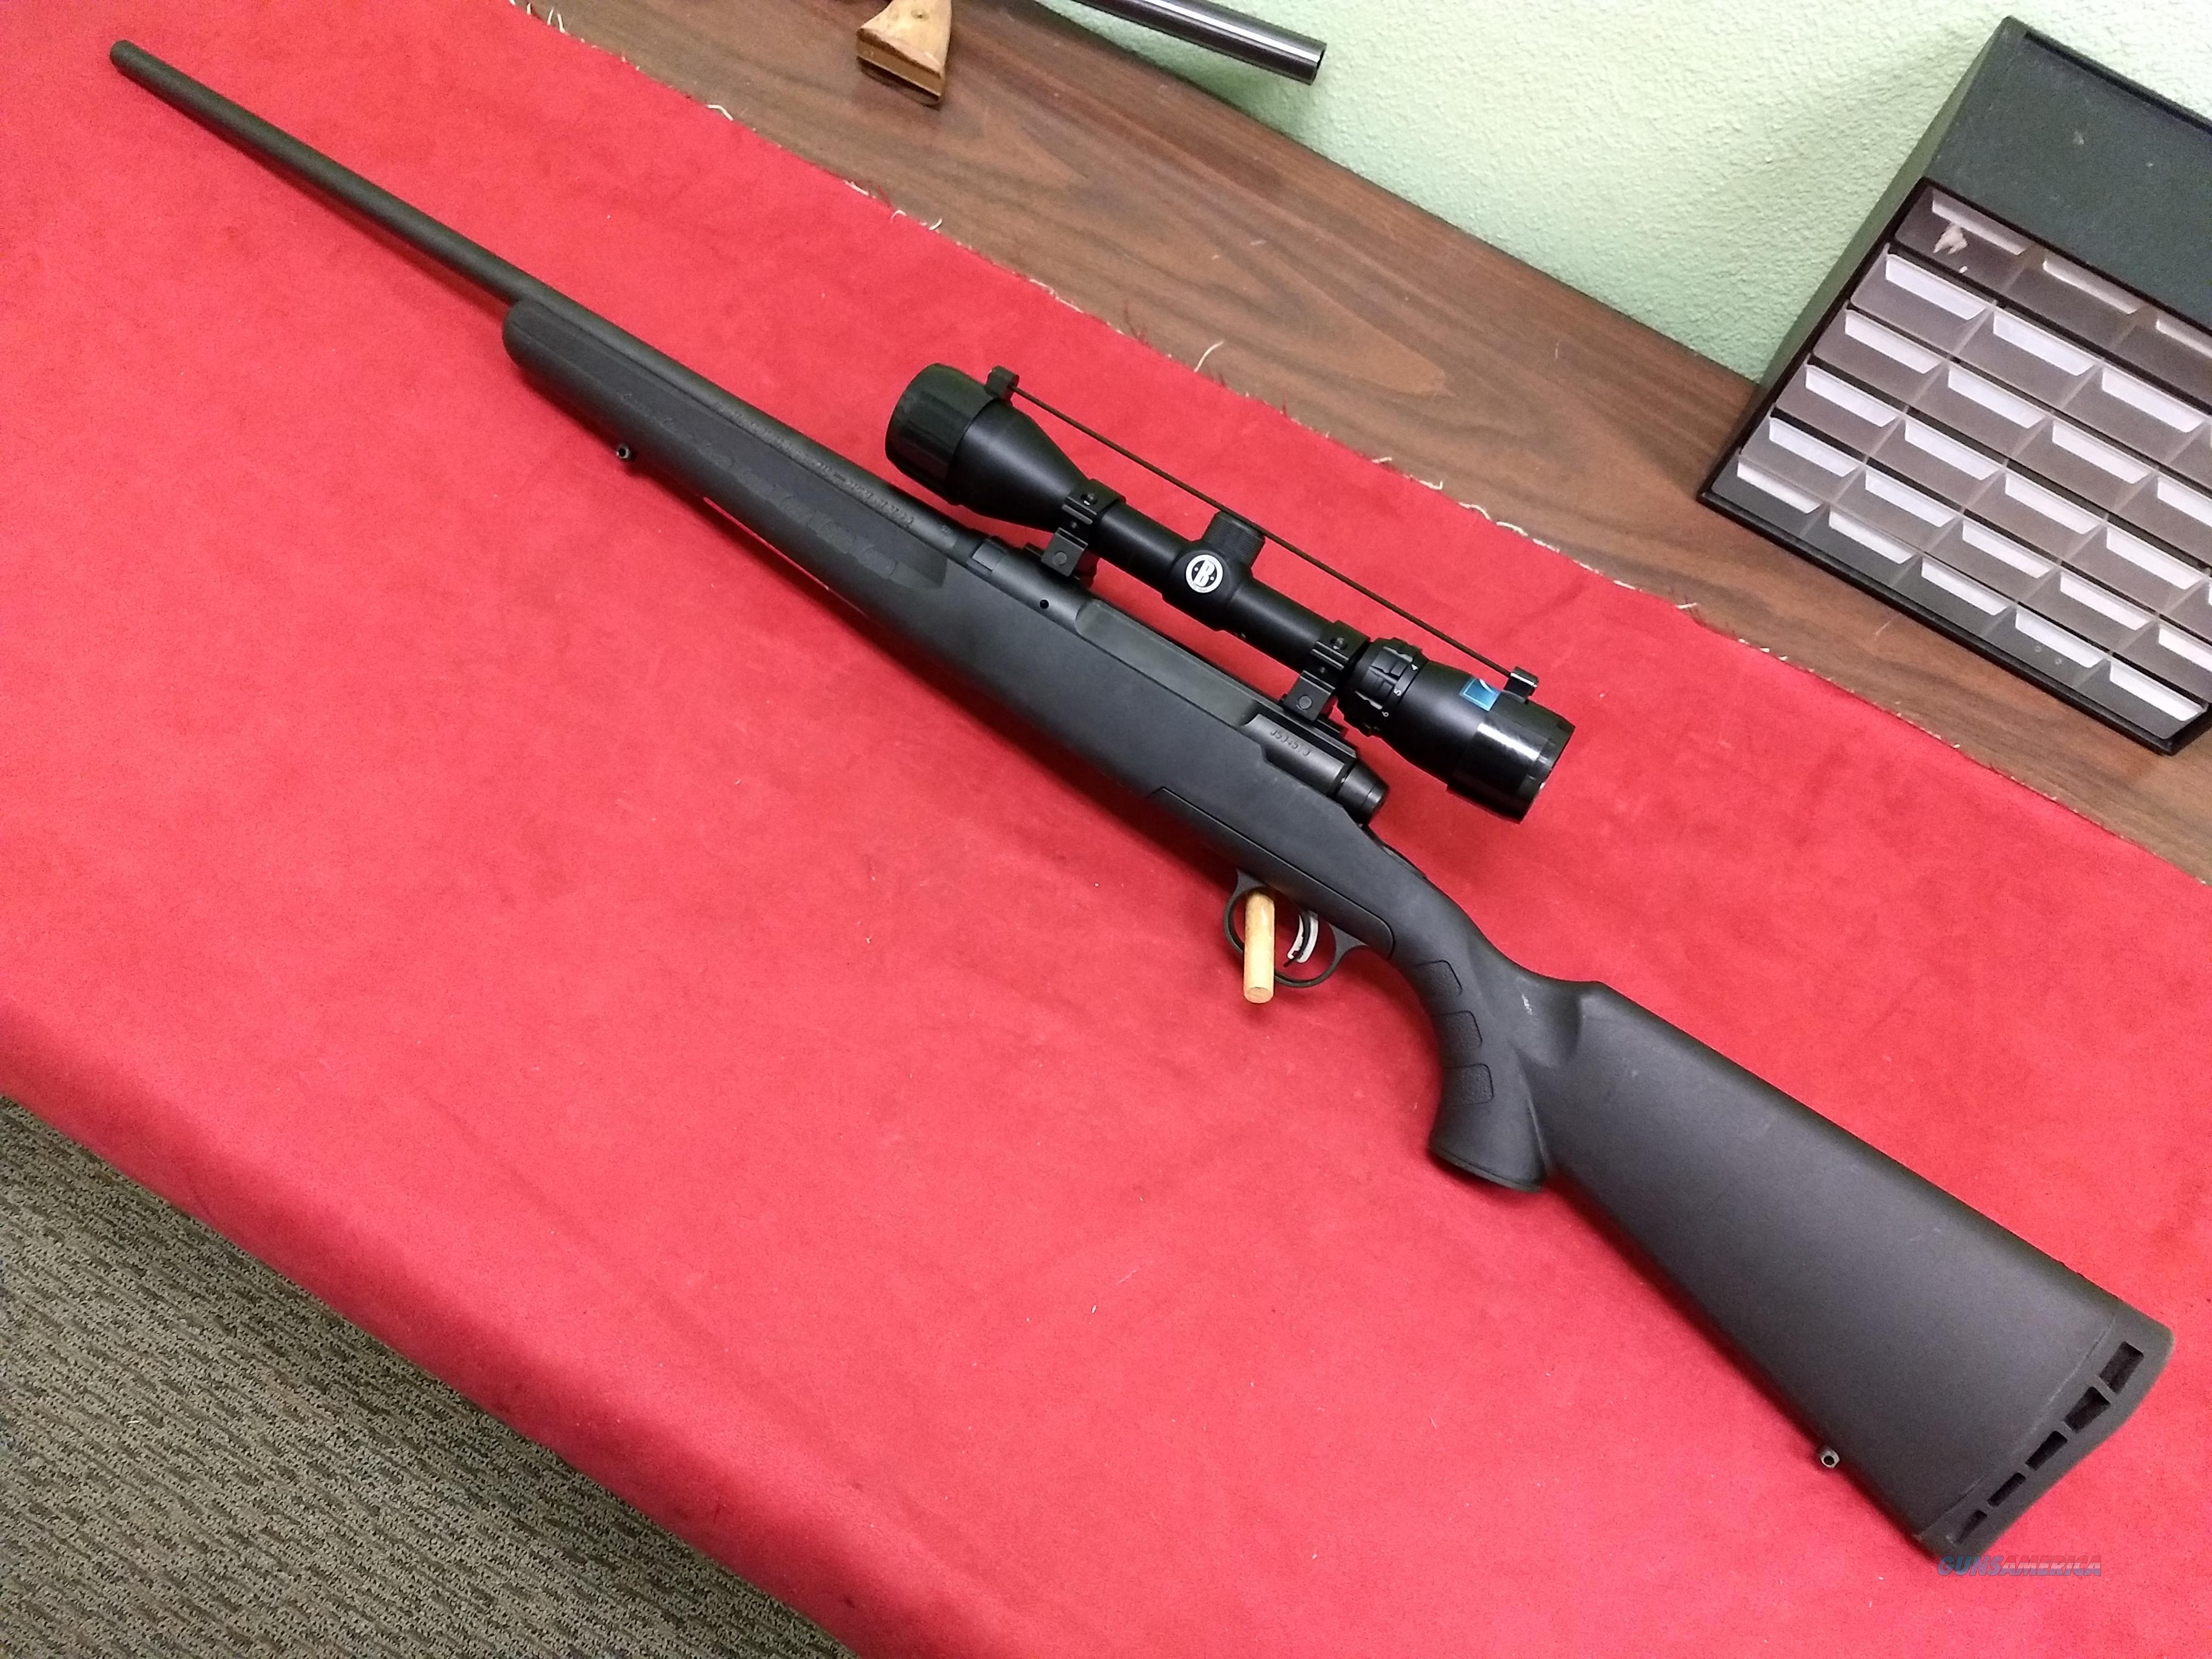 Savage Axis Rifle with Bushnell 3-9X40 Scope, .30-06 Caliber  Guns > Rifles > Savage Rifles > Axis